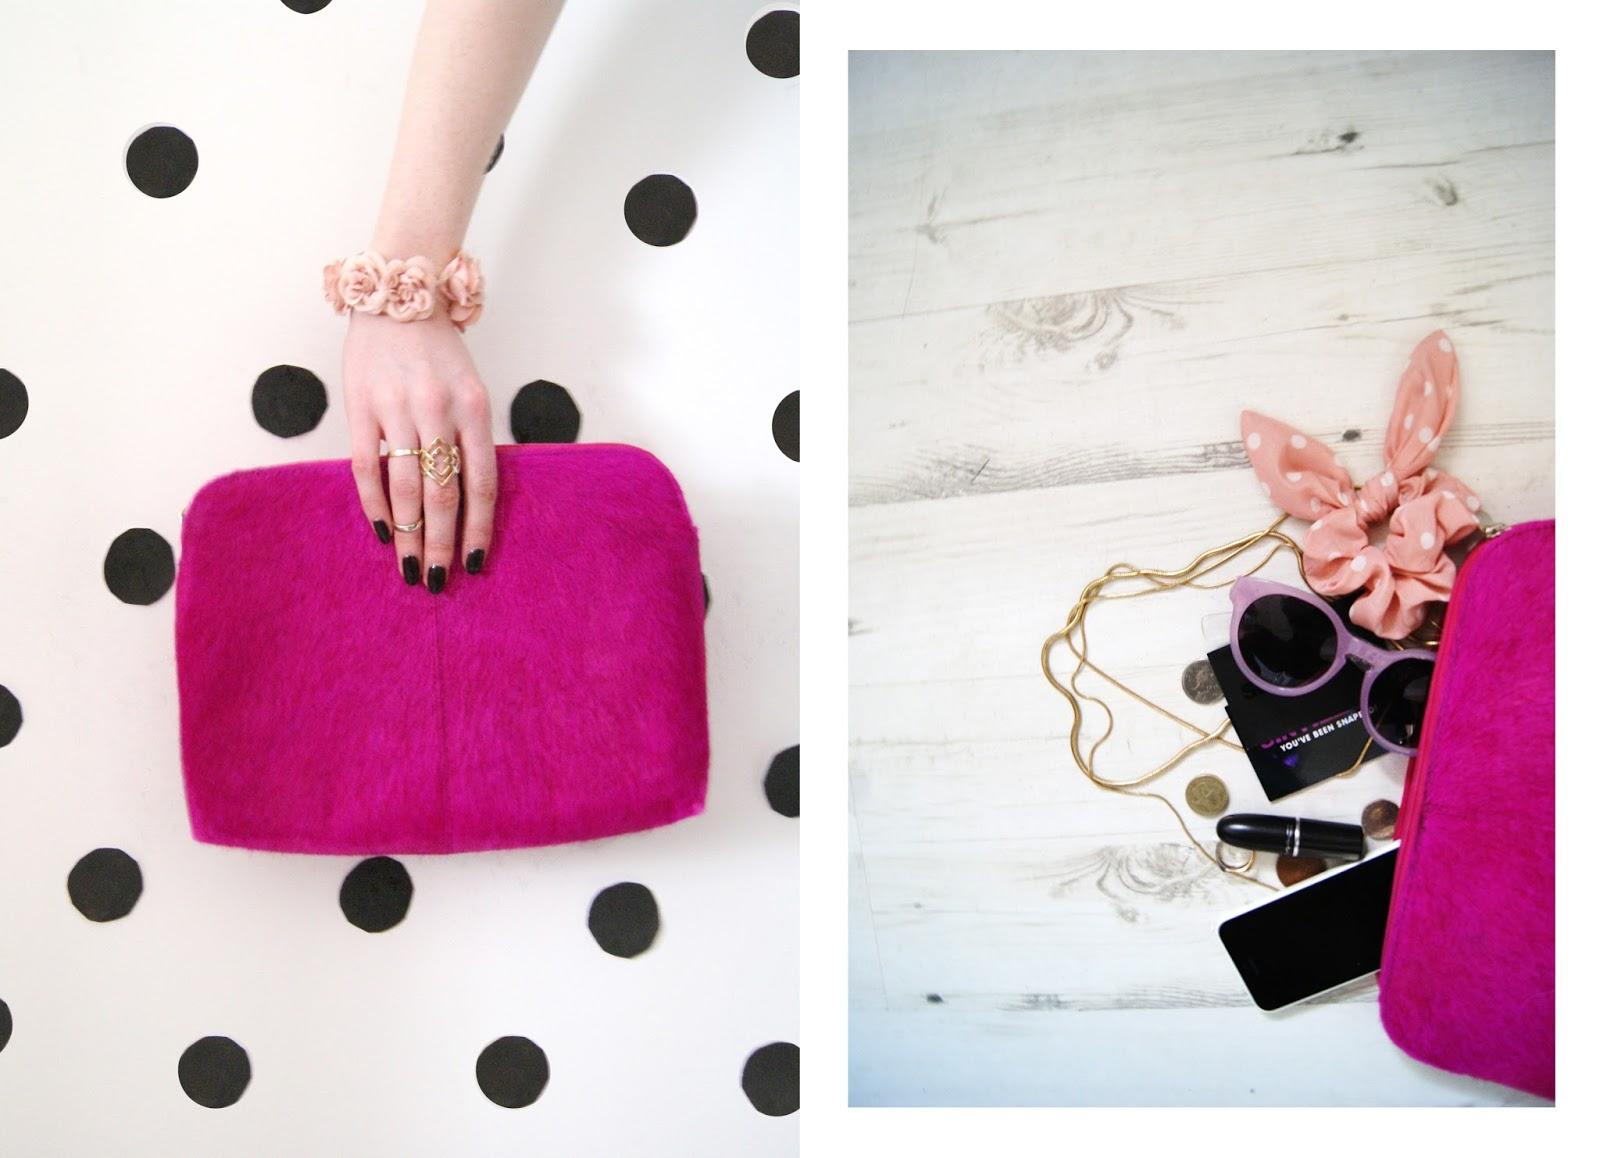 Leather fur neon pink clutch bag - www.thegoodowl.co.uk